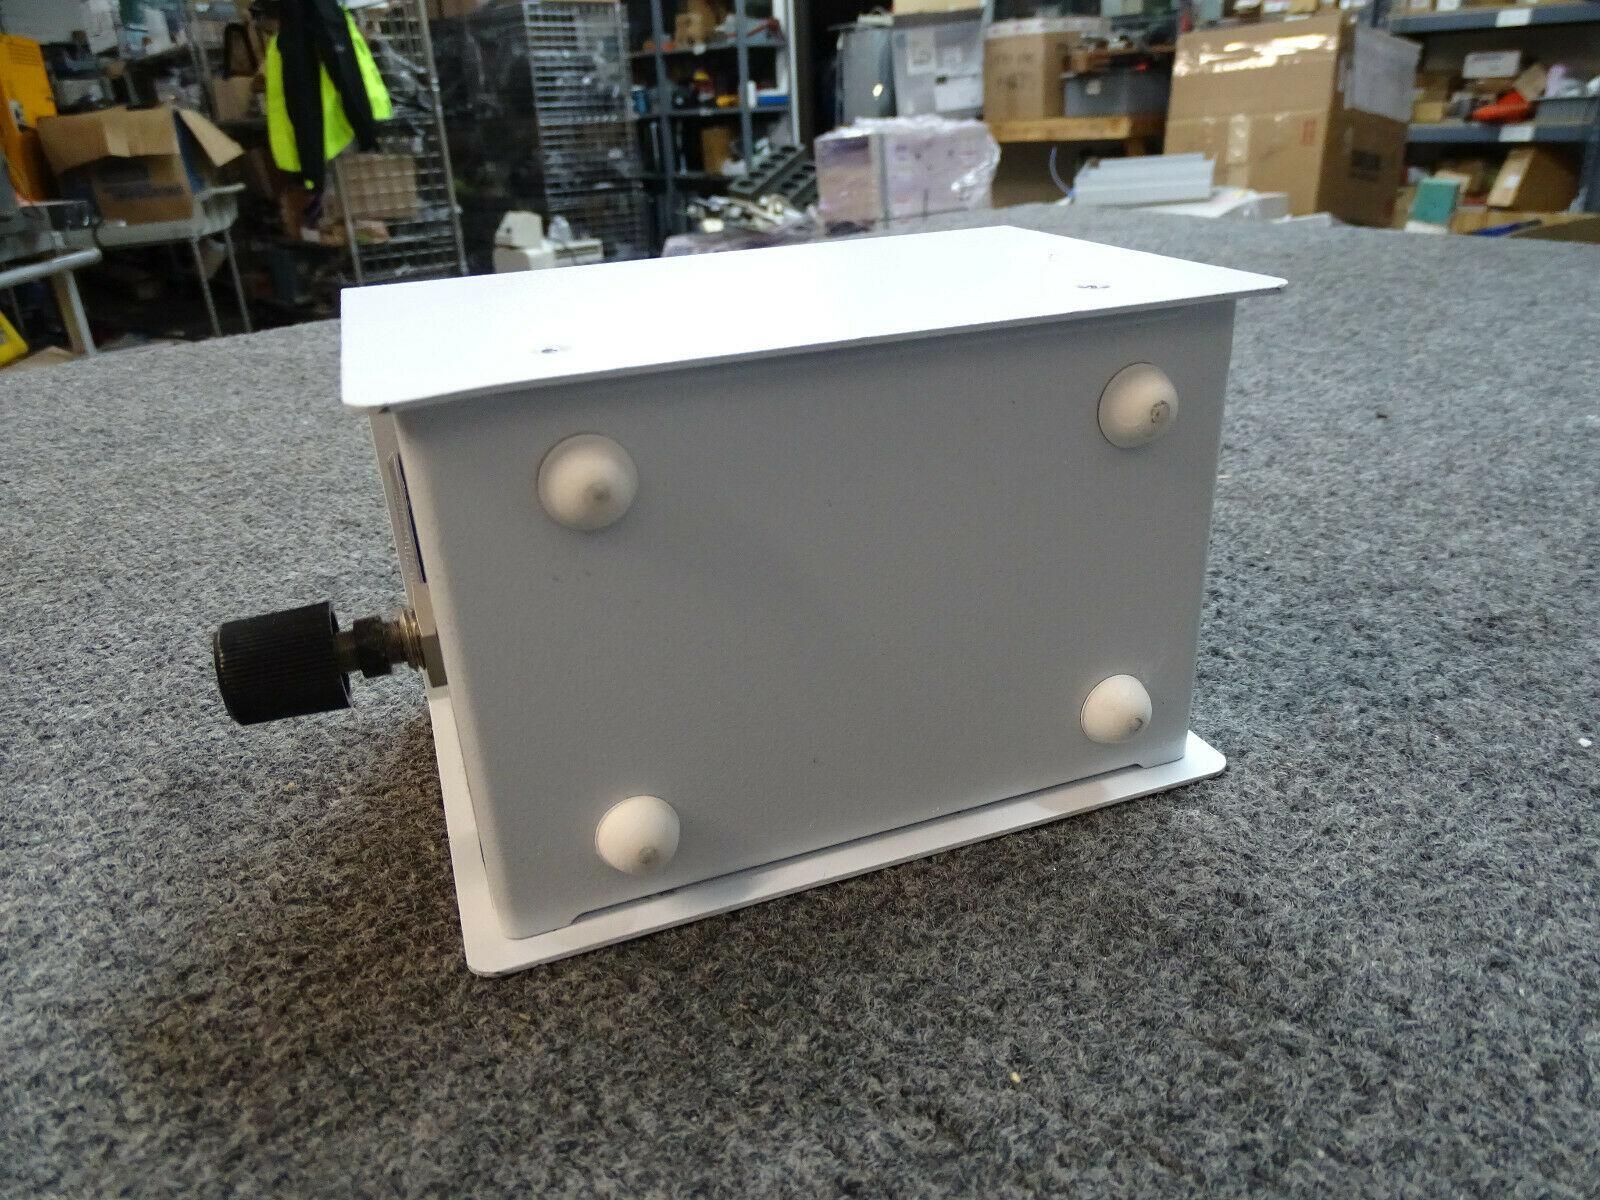 Teledyne Instruments 14-3938-000 External Gas Pressure Regulator.